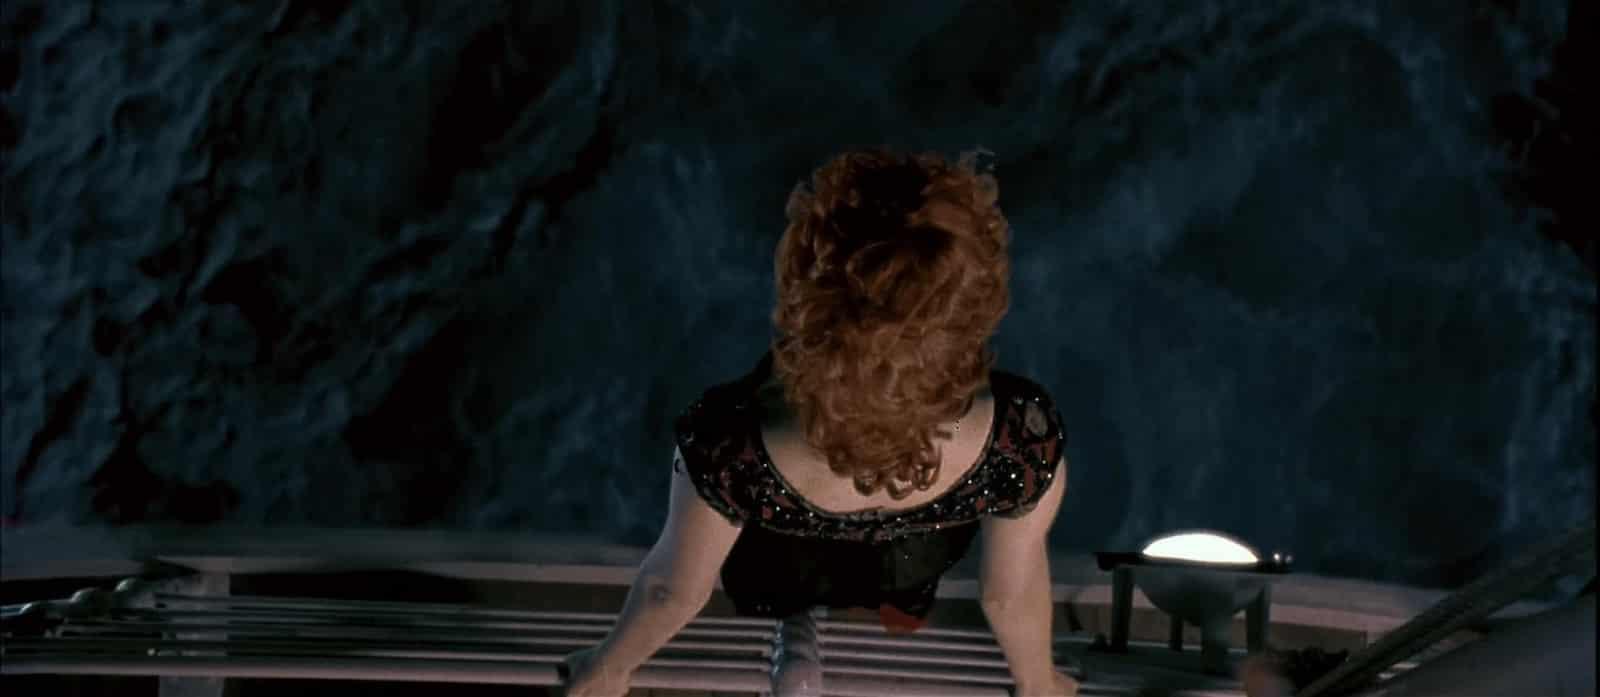 High-Angle-Shot-Camera-Angles-Rose-Titanic